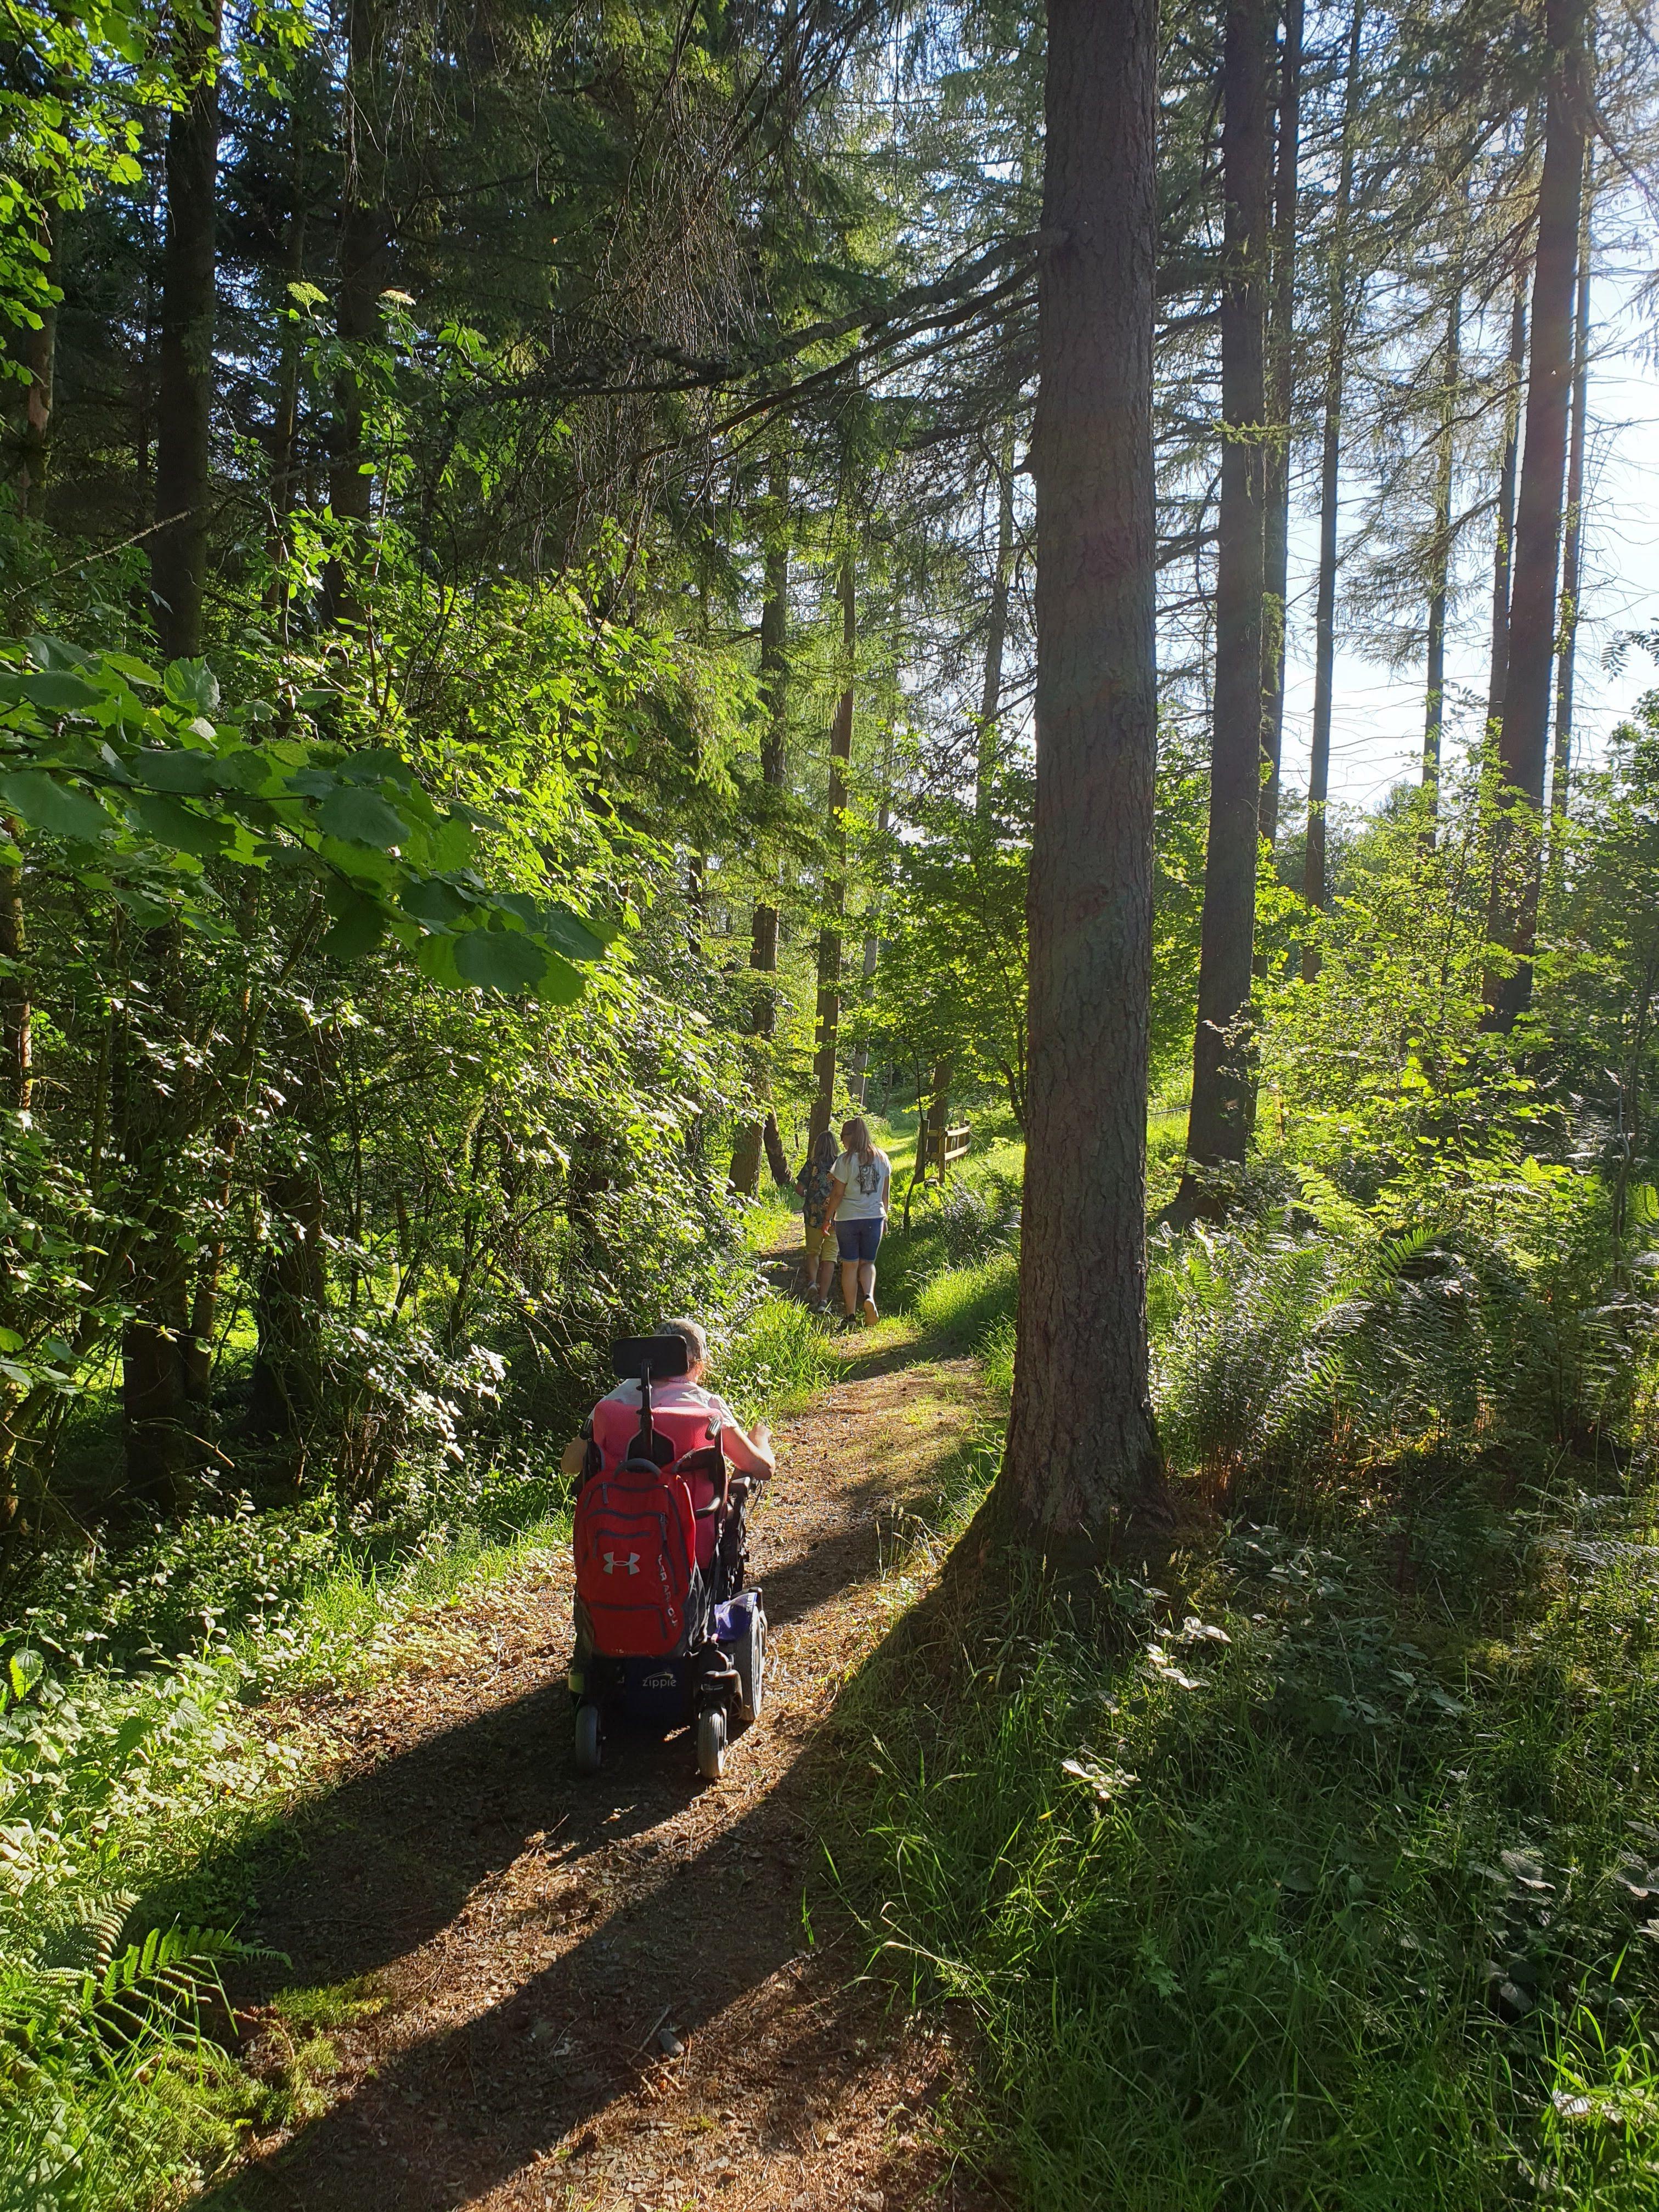 Saskia leads the way in her Whizz-Kidz powered wheelchair